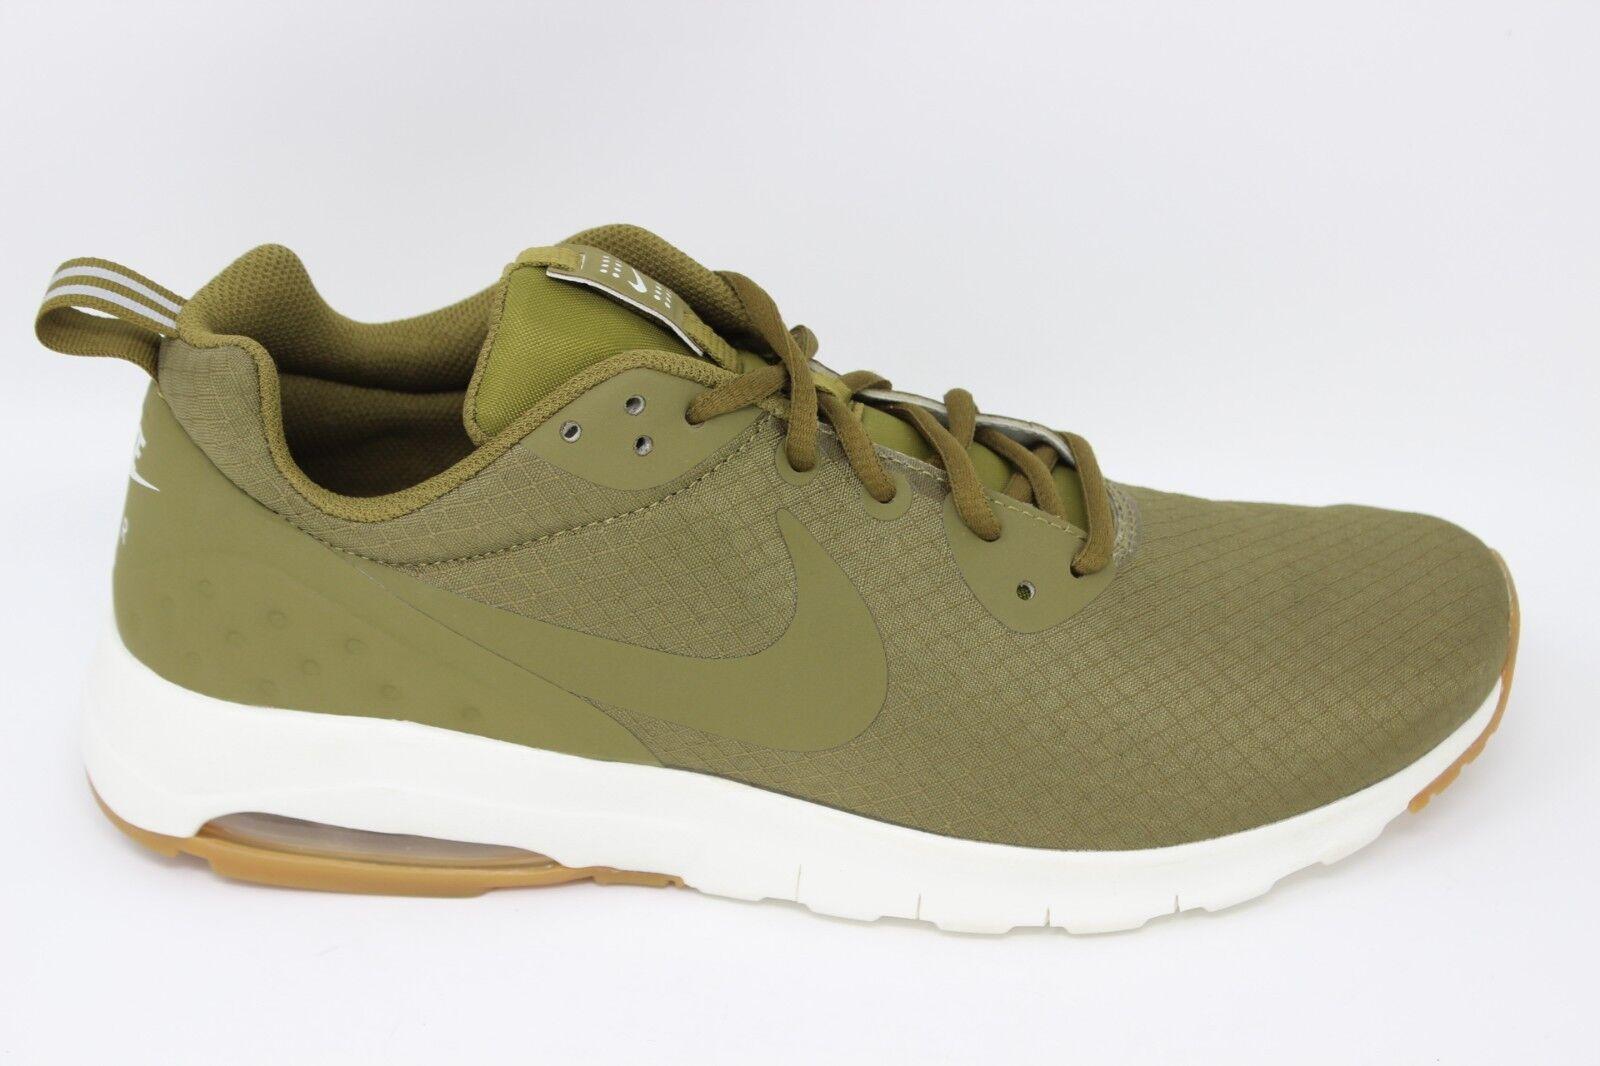 Nike Men's Air Max Motion LW SE 844836 330 Olive Flak/Sail-Gum Brand New